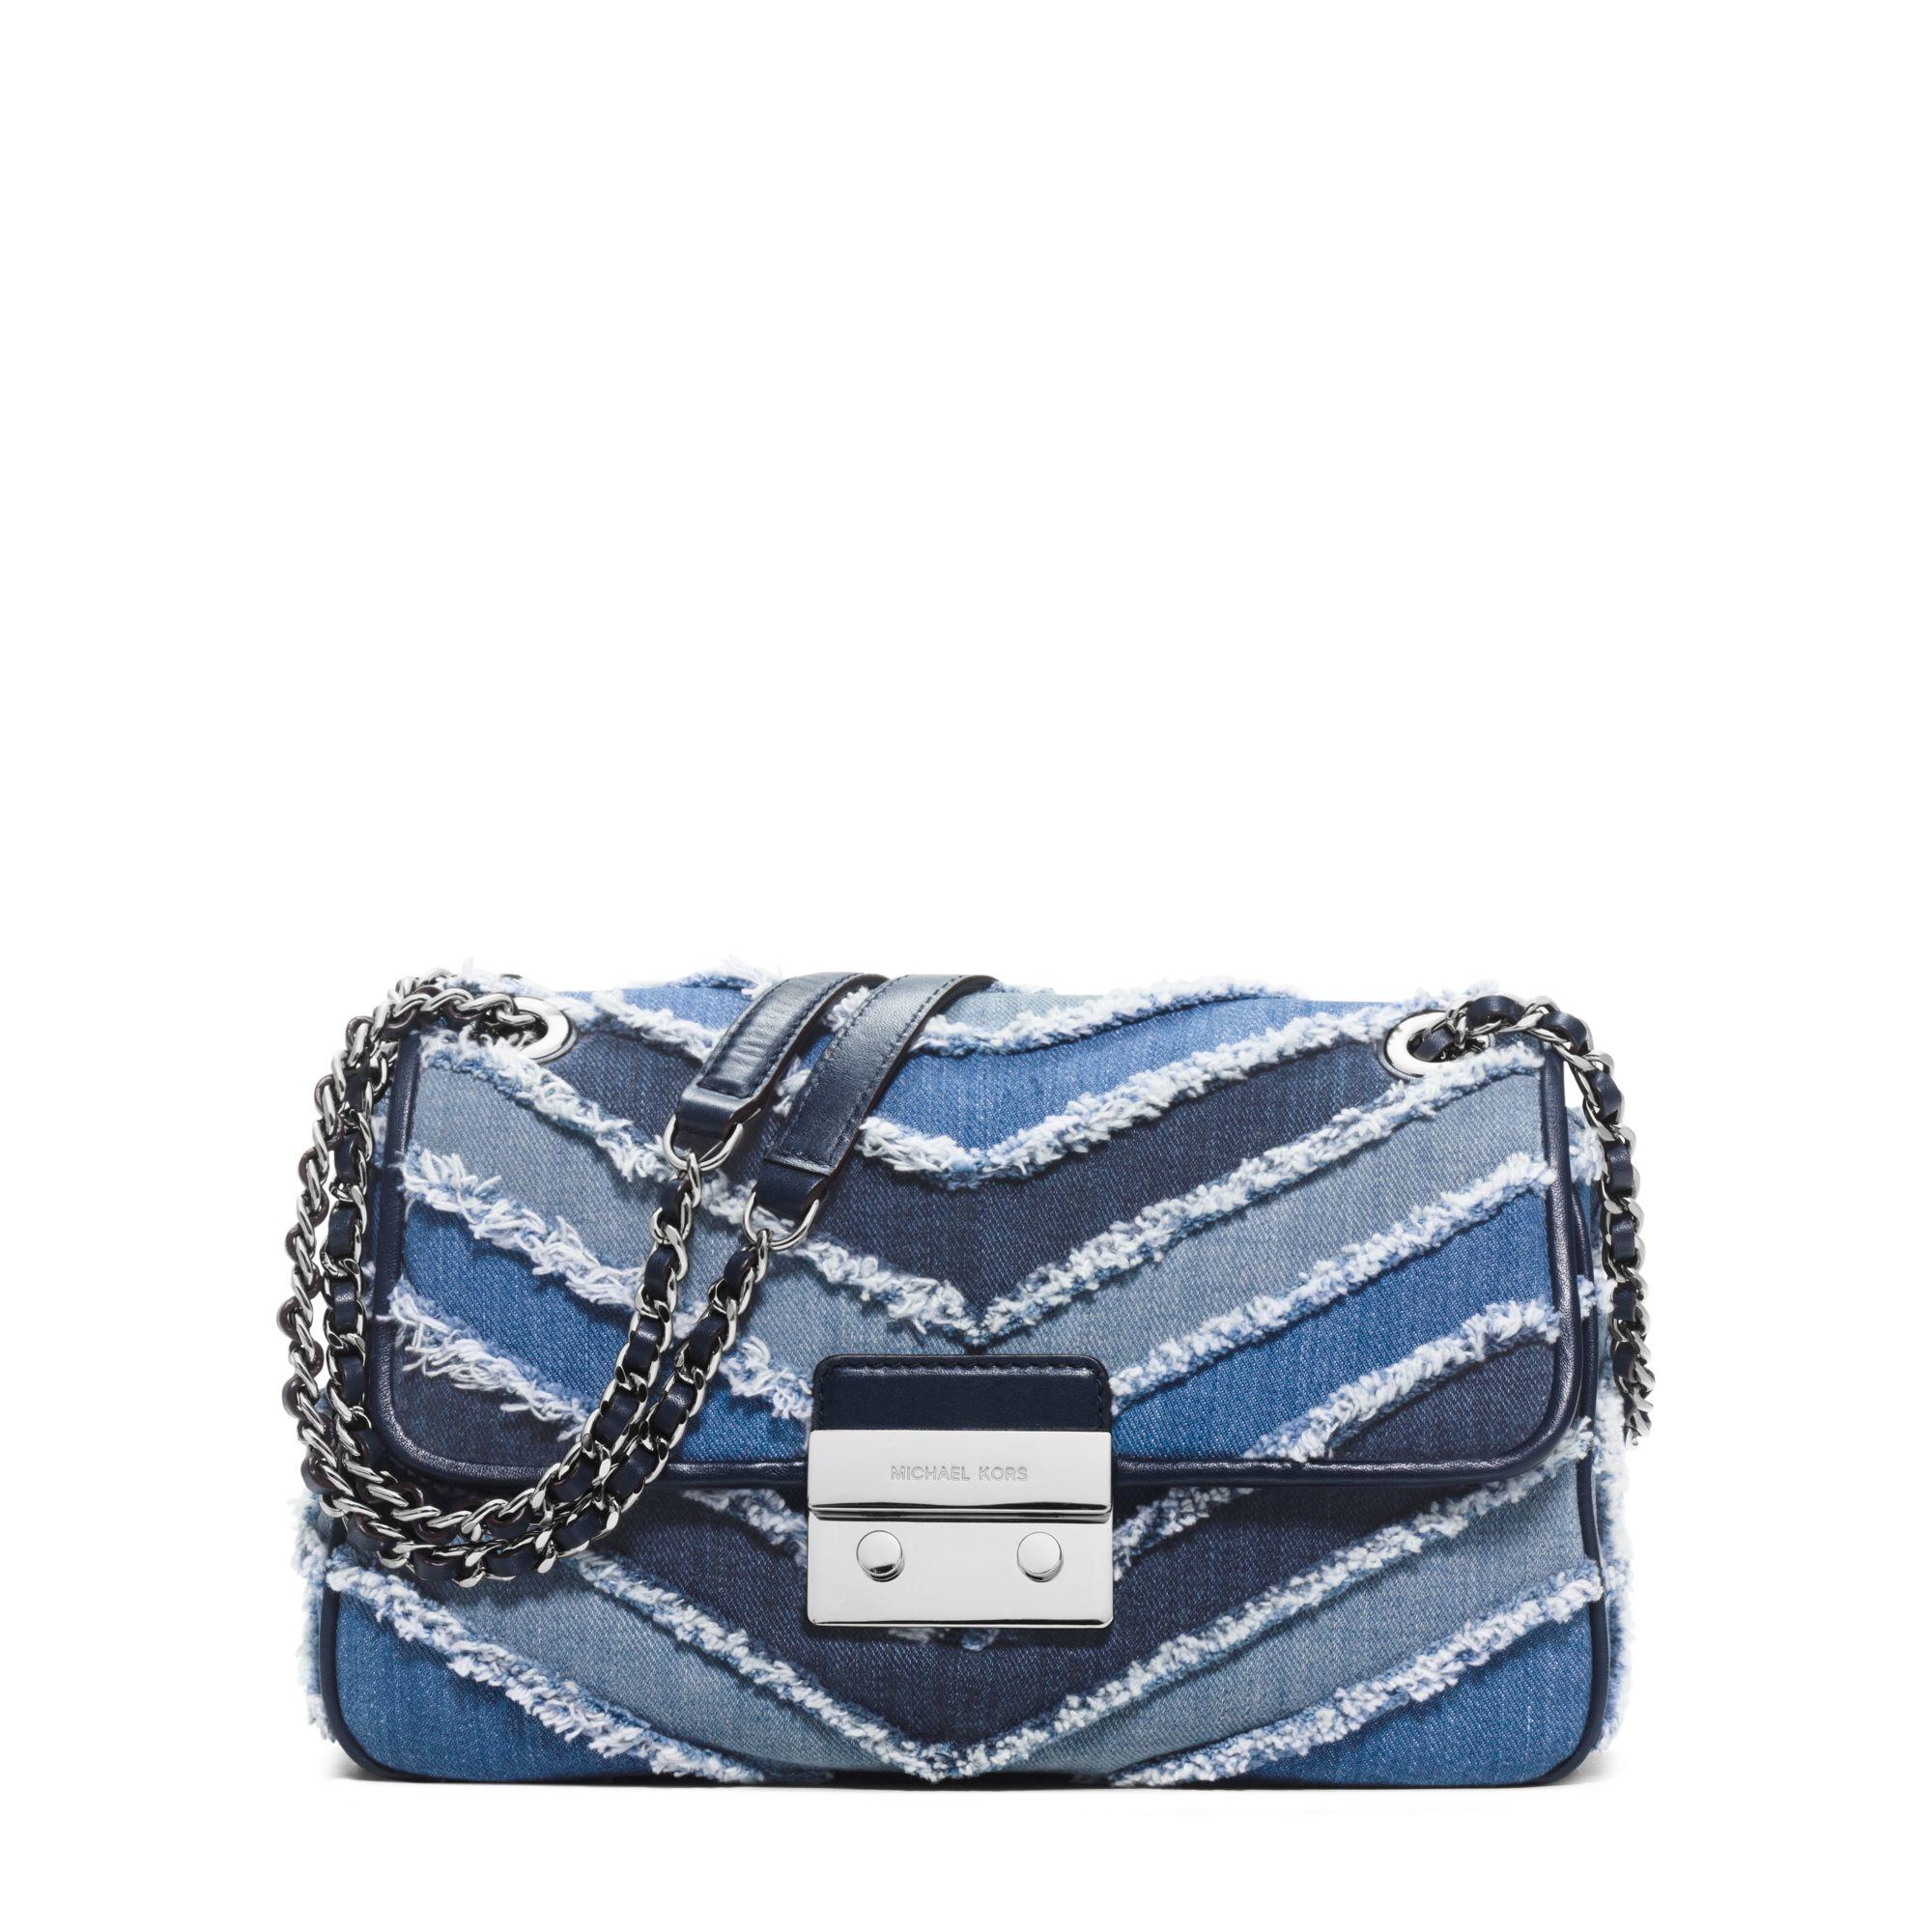 b76604138c19 Michael Kors Sloan Large Denim Chevron Shoulder Bag in Blue - Lyst